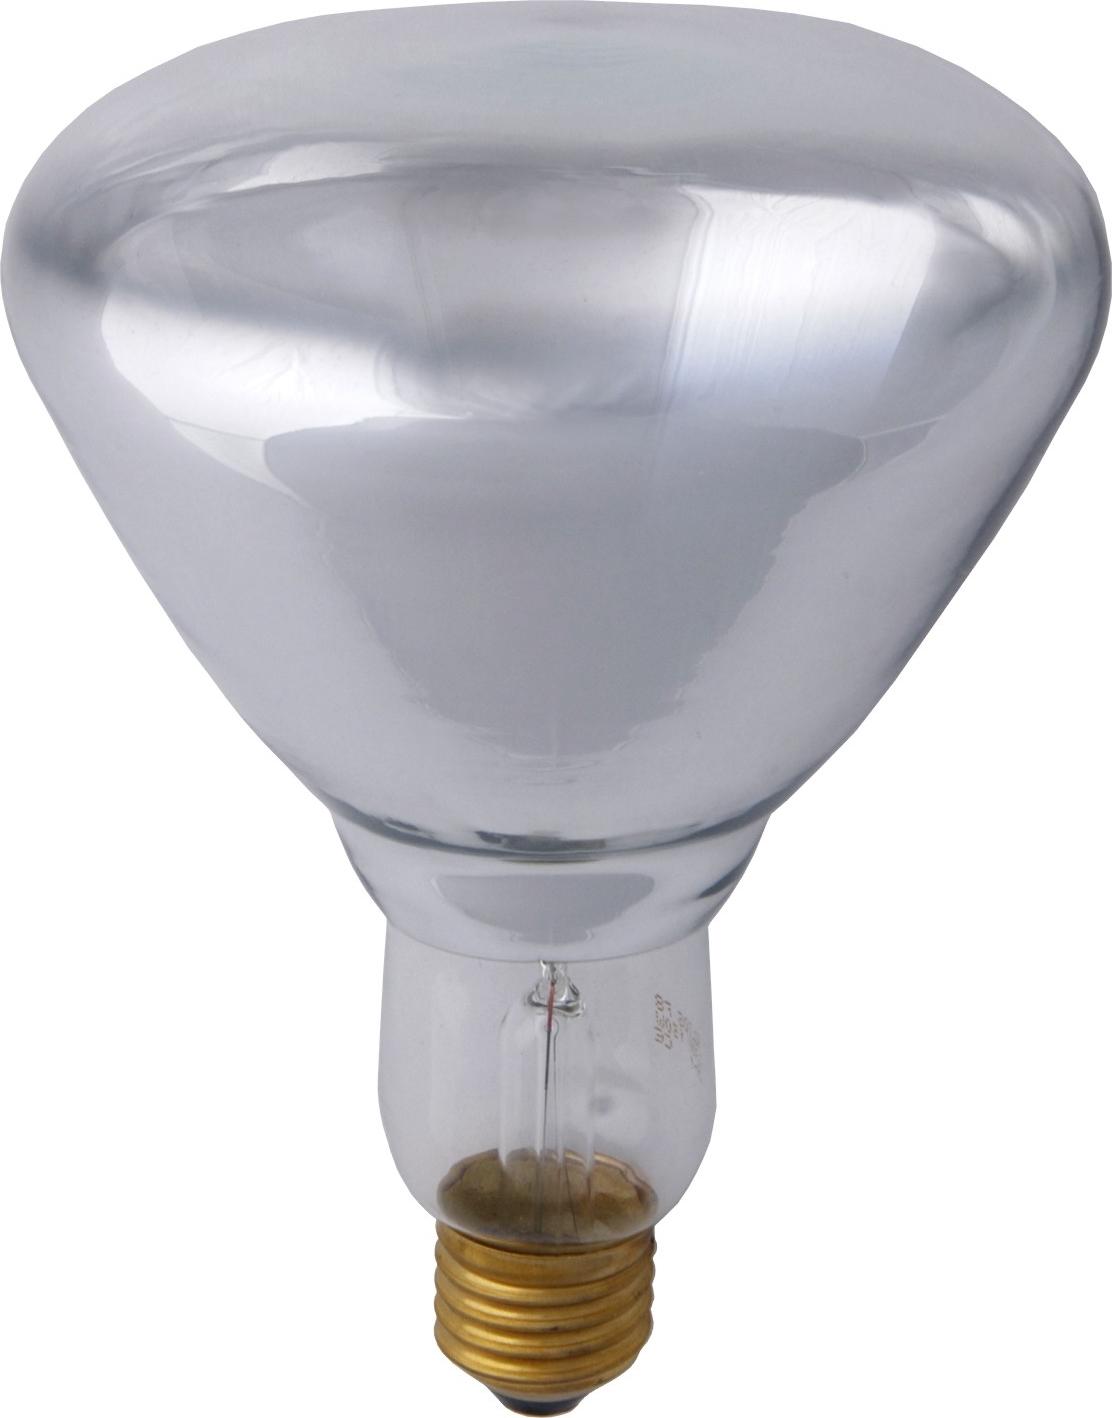 Ir2 Hard Glass Infrared Heat Lamp Helios